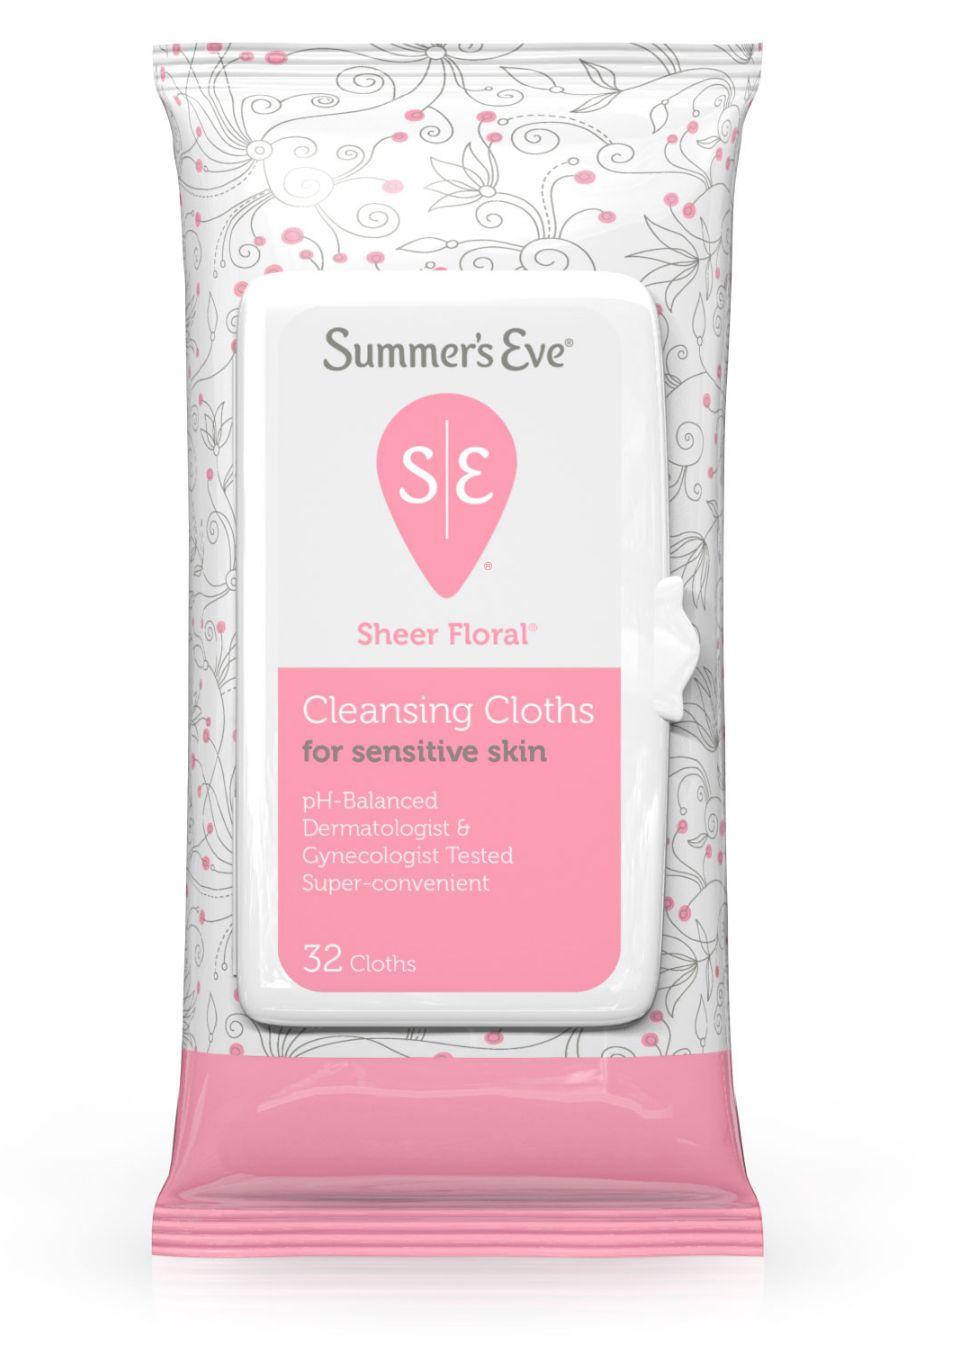 3 Pack Summers Eve Feminine Cleansing Cloths Sensitive Skin Sheer Floral 32 Each Dr. Jart+ Premium BB Beauty Balm (Size : 1.5 oz)